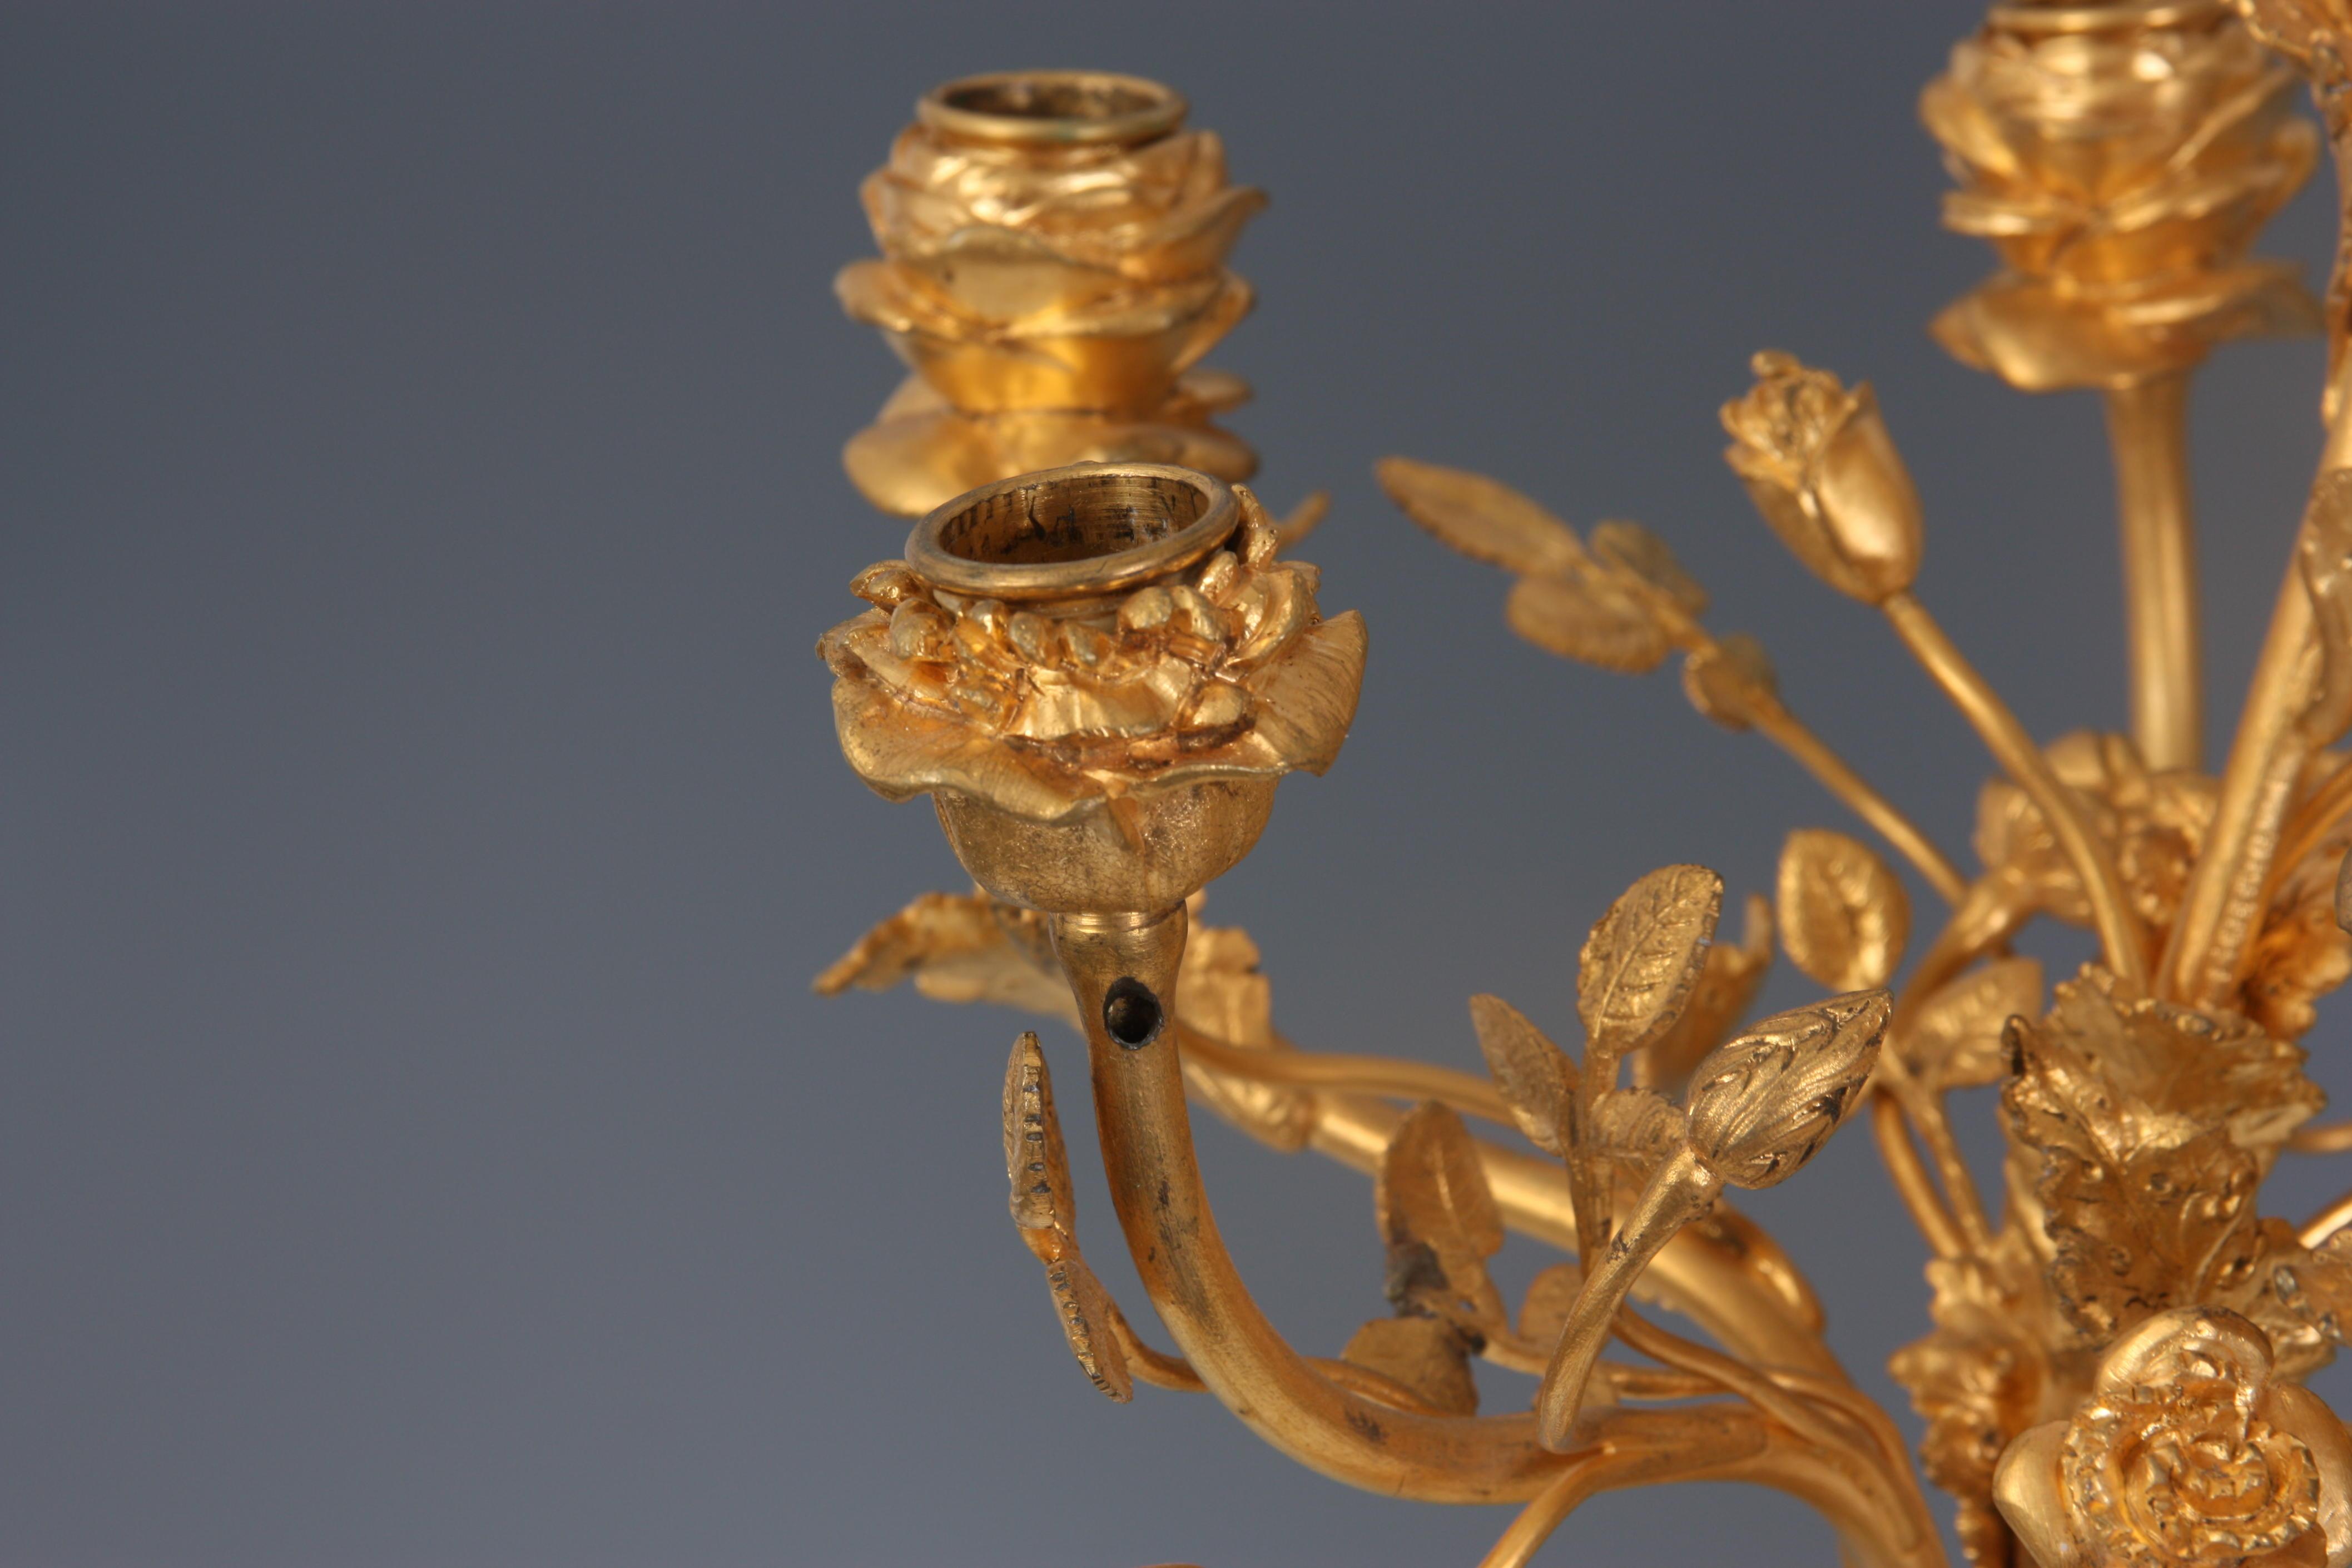 Ornate rams head photo